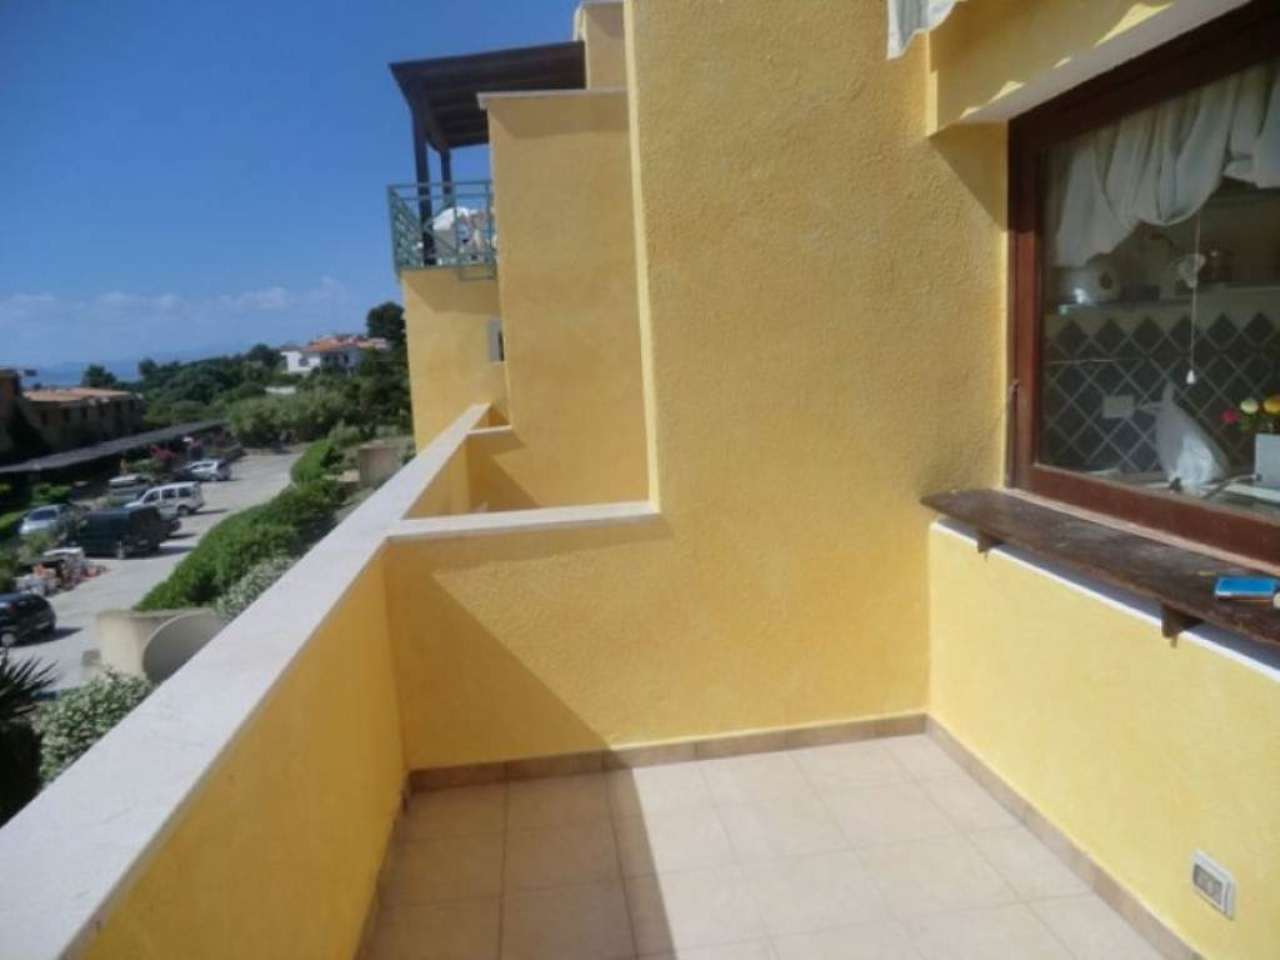 Appartamento bilocale in vendita a Golfo Aranci (OT)